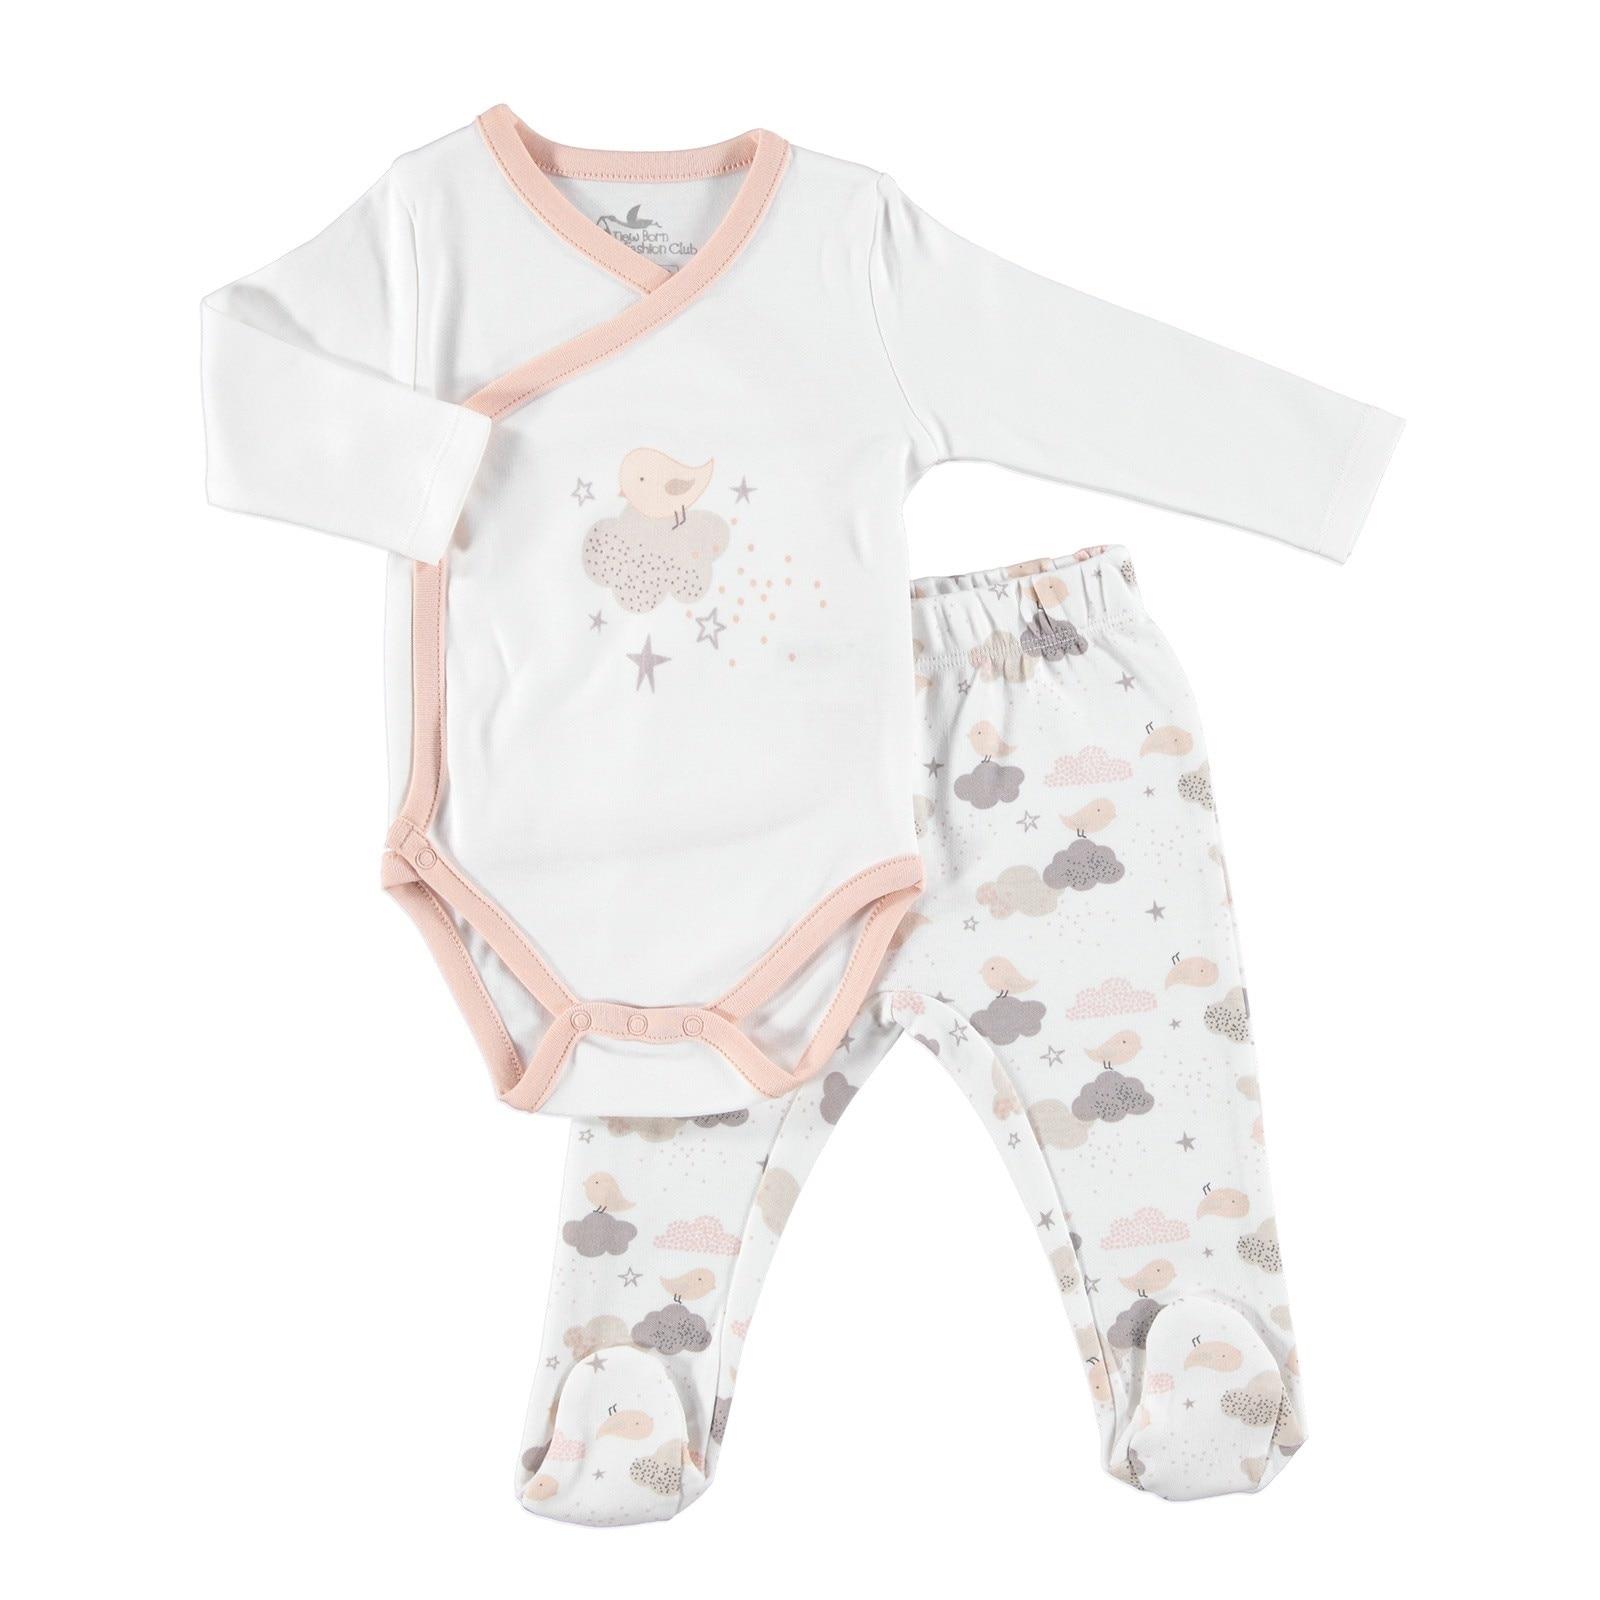 Ebebek Newborn Fashion Club Fun Winter Baby Bodysuits Footed Pants